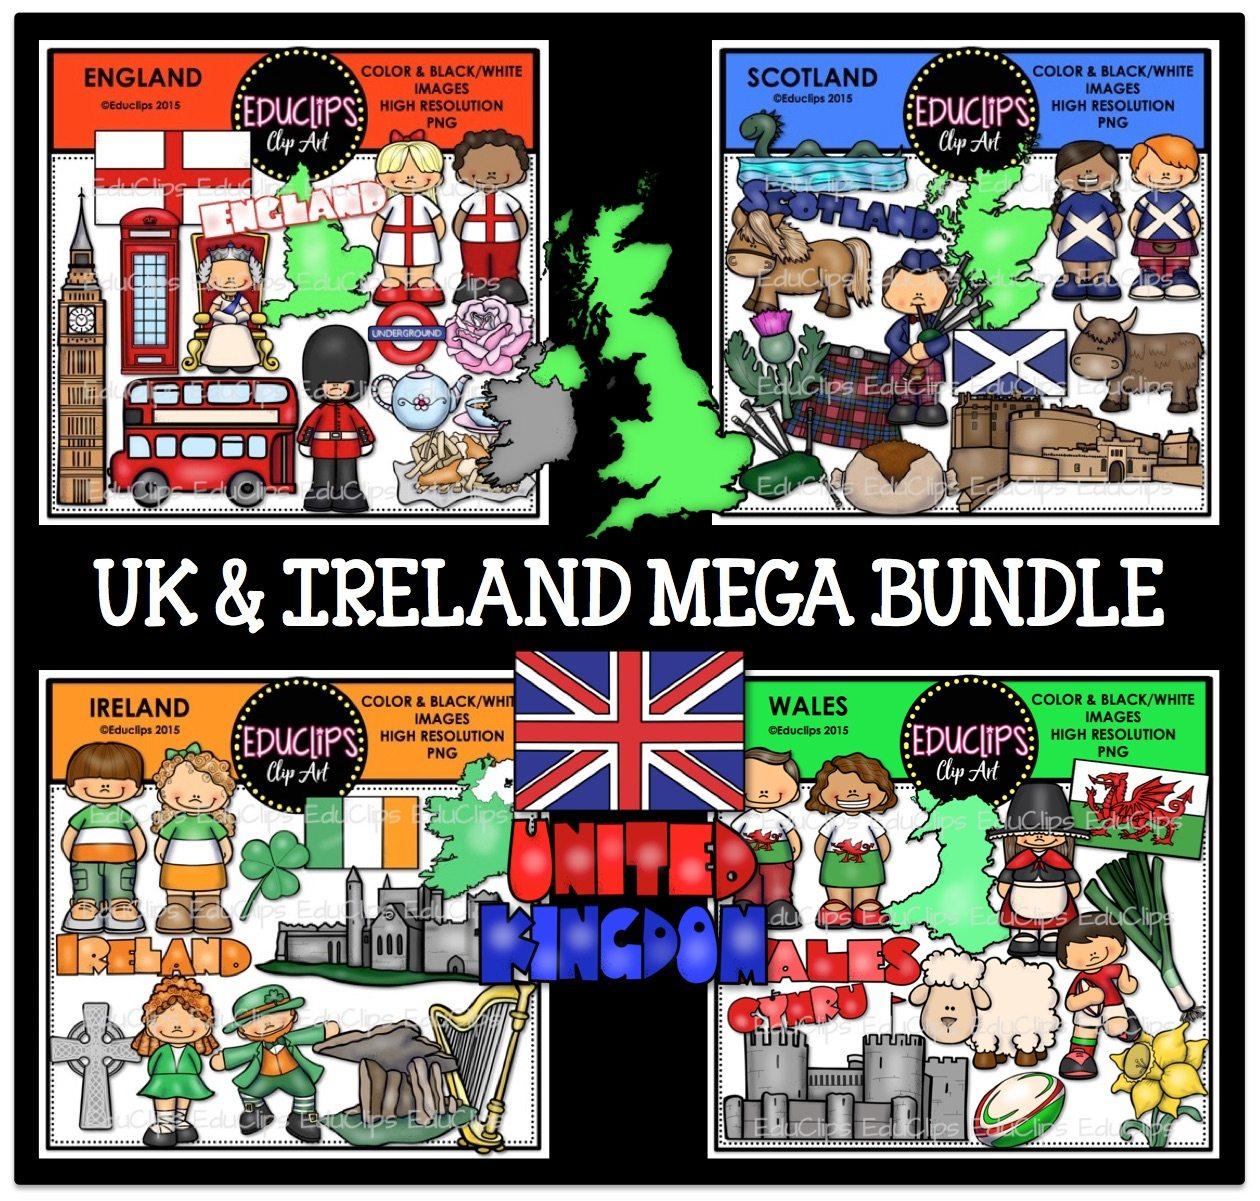 uk u0026 ireland clip art bundle color and b u0026w welcome to educlips